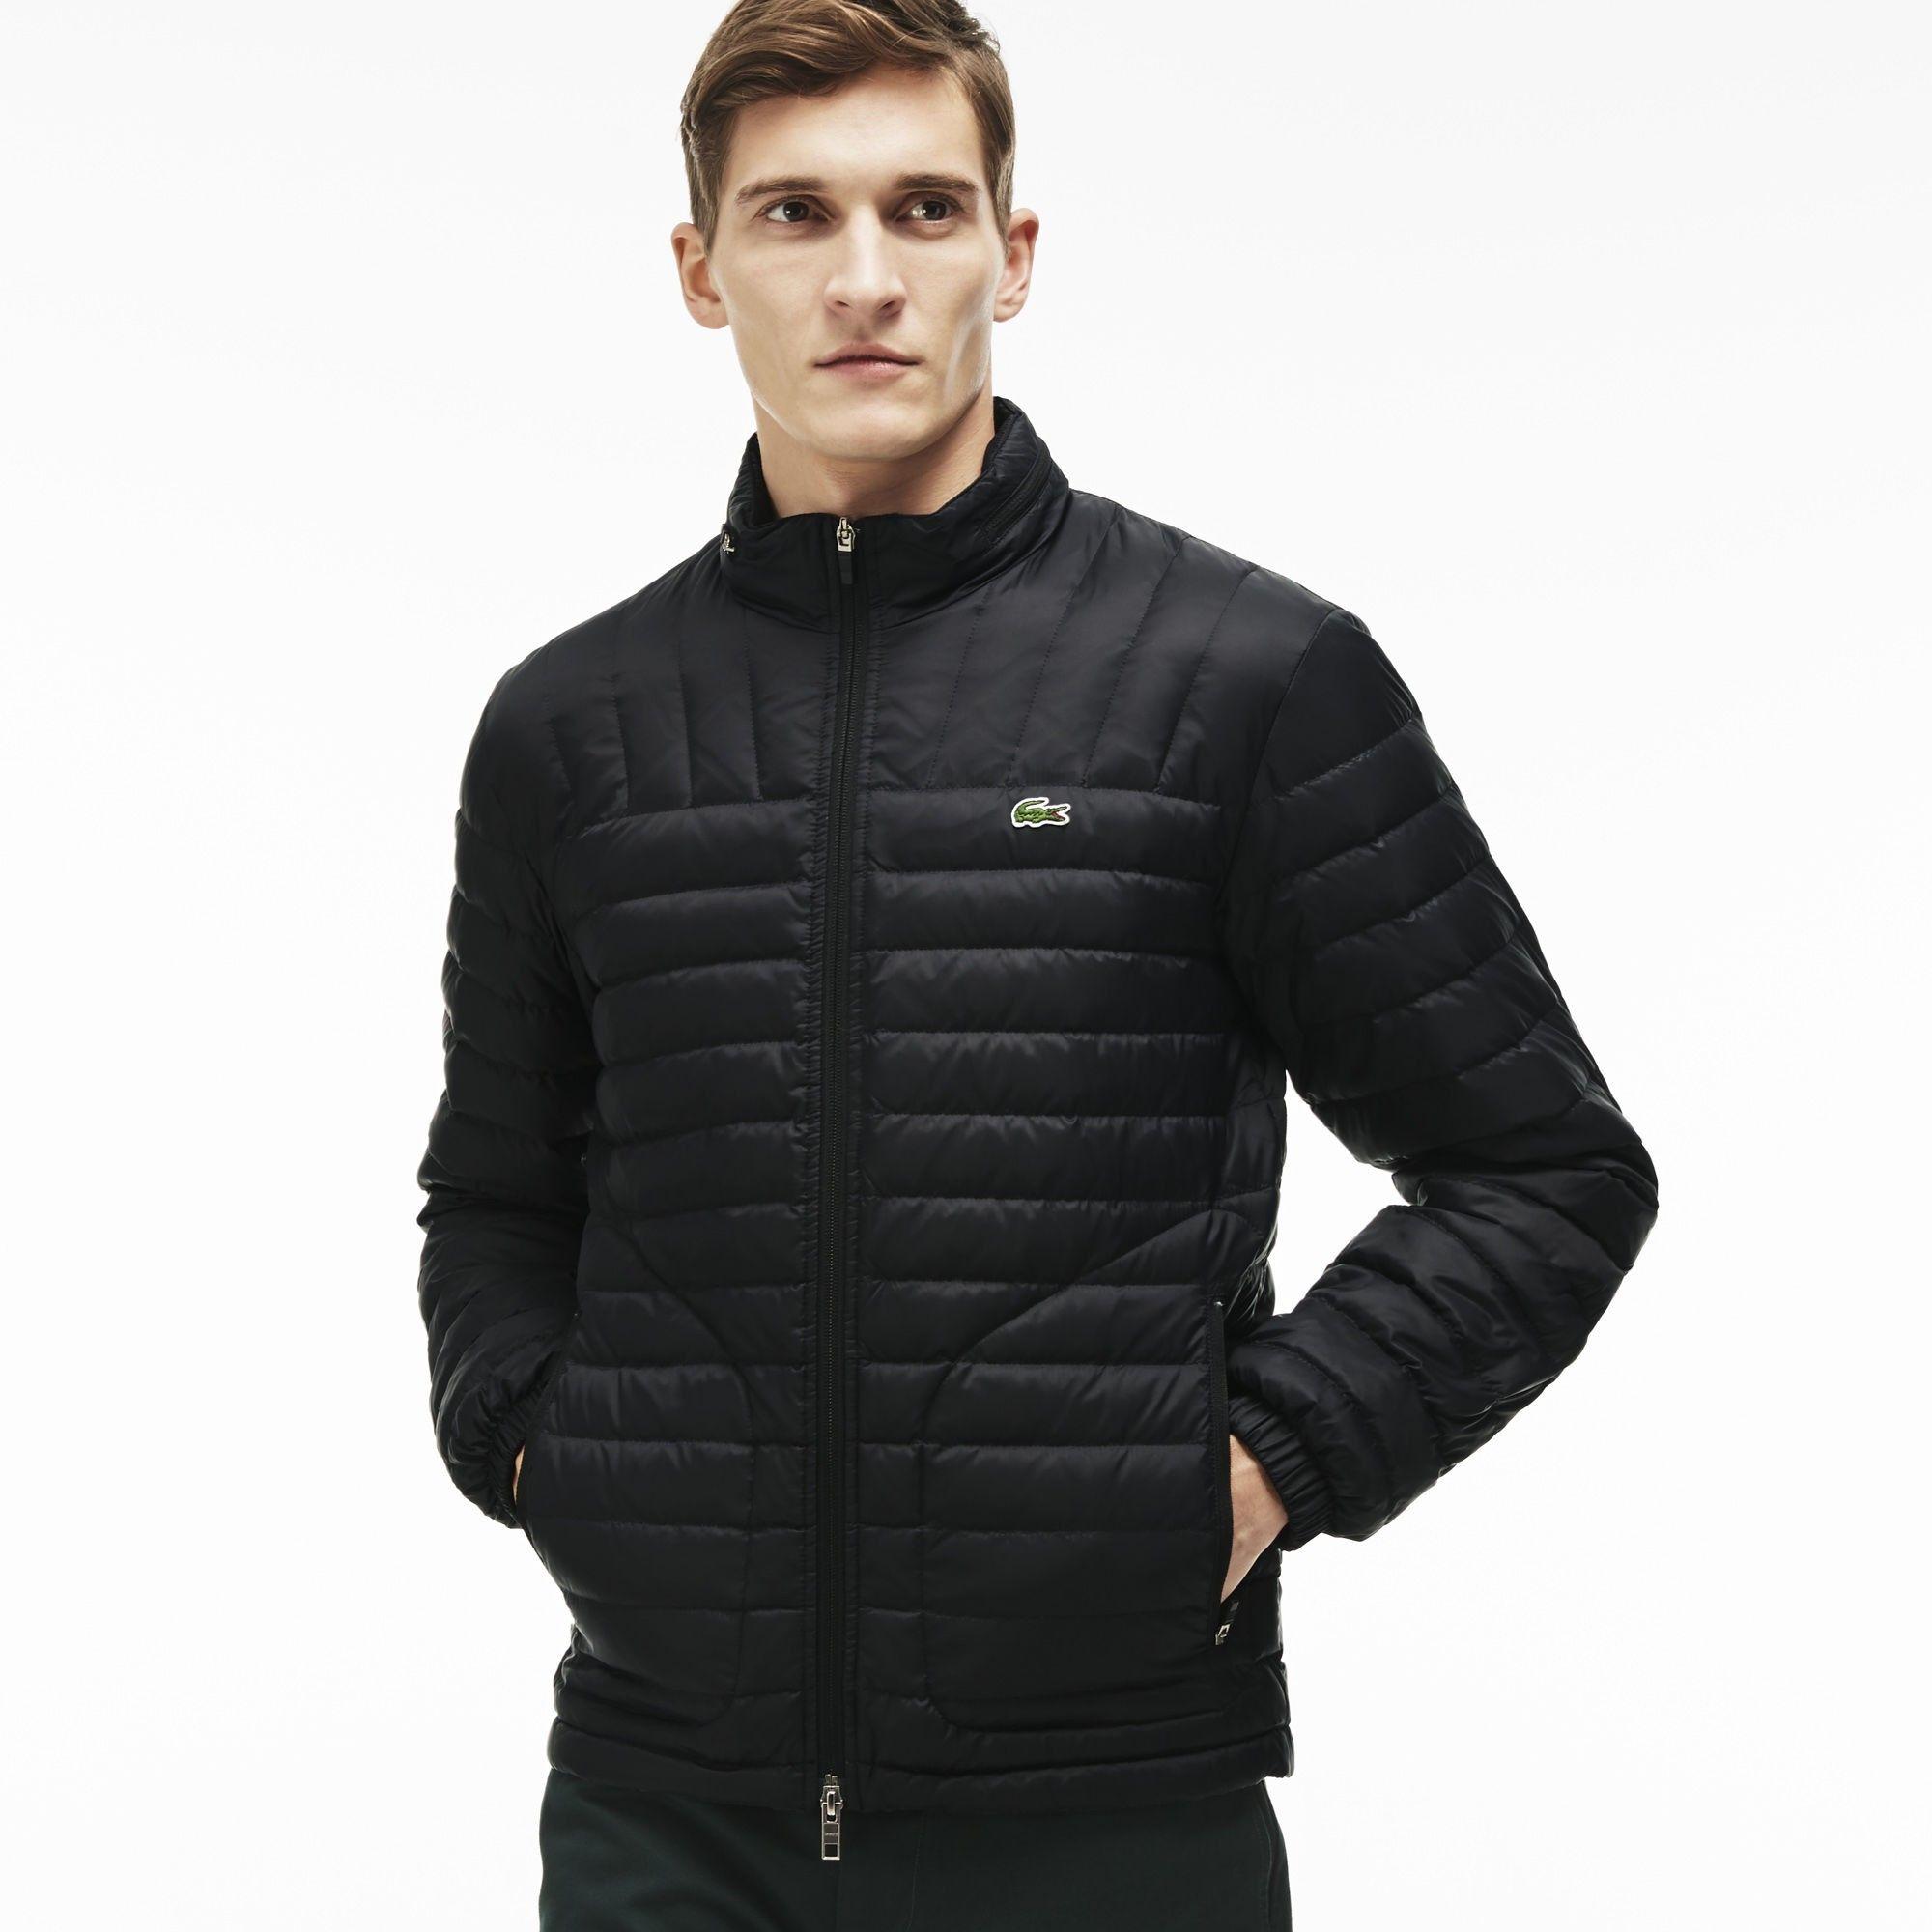 16496436ec LACOSTE Men'S Lightweight Jacket - Black. #lacoste #cloth #all ...